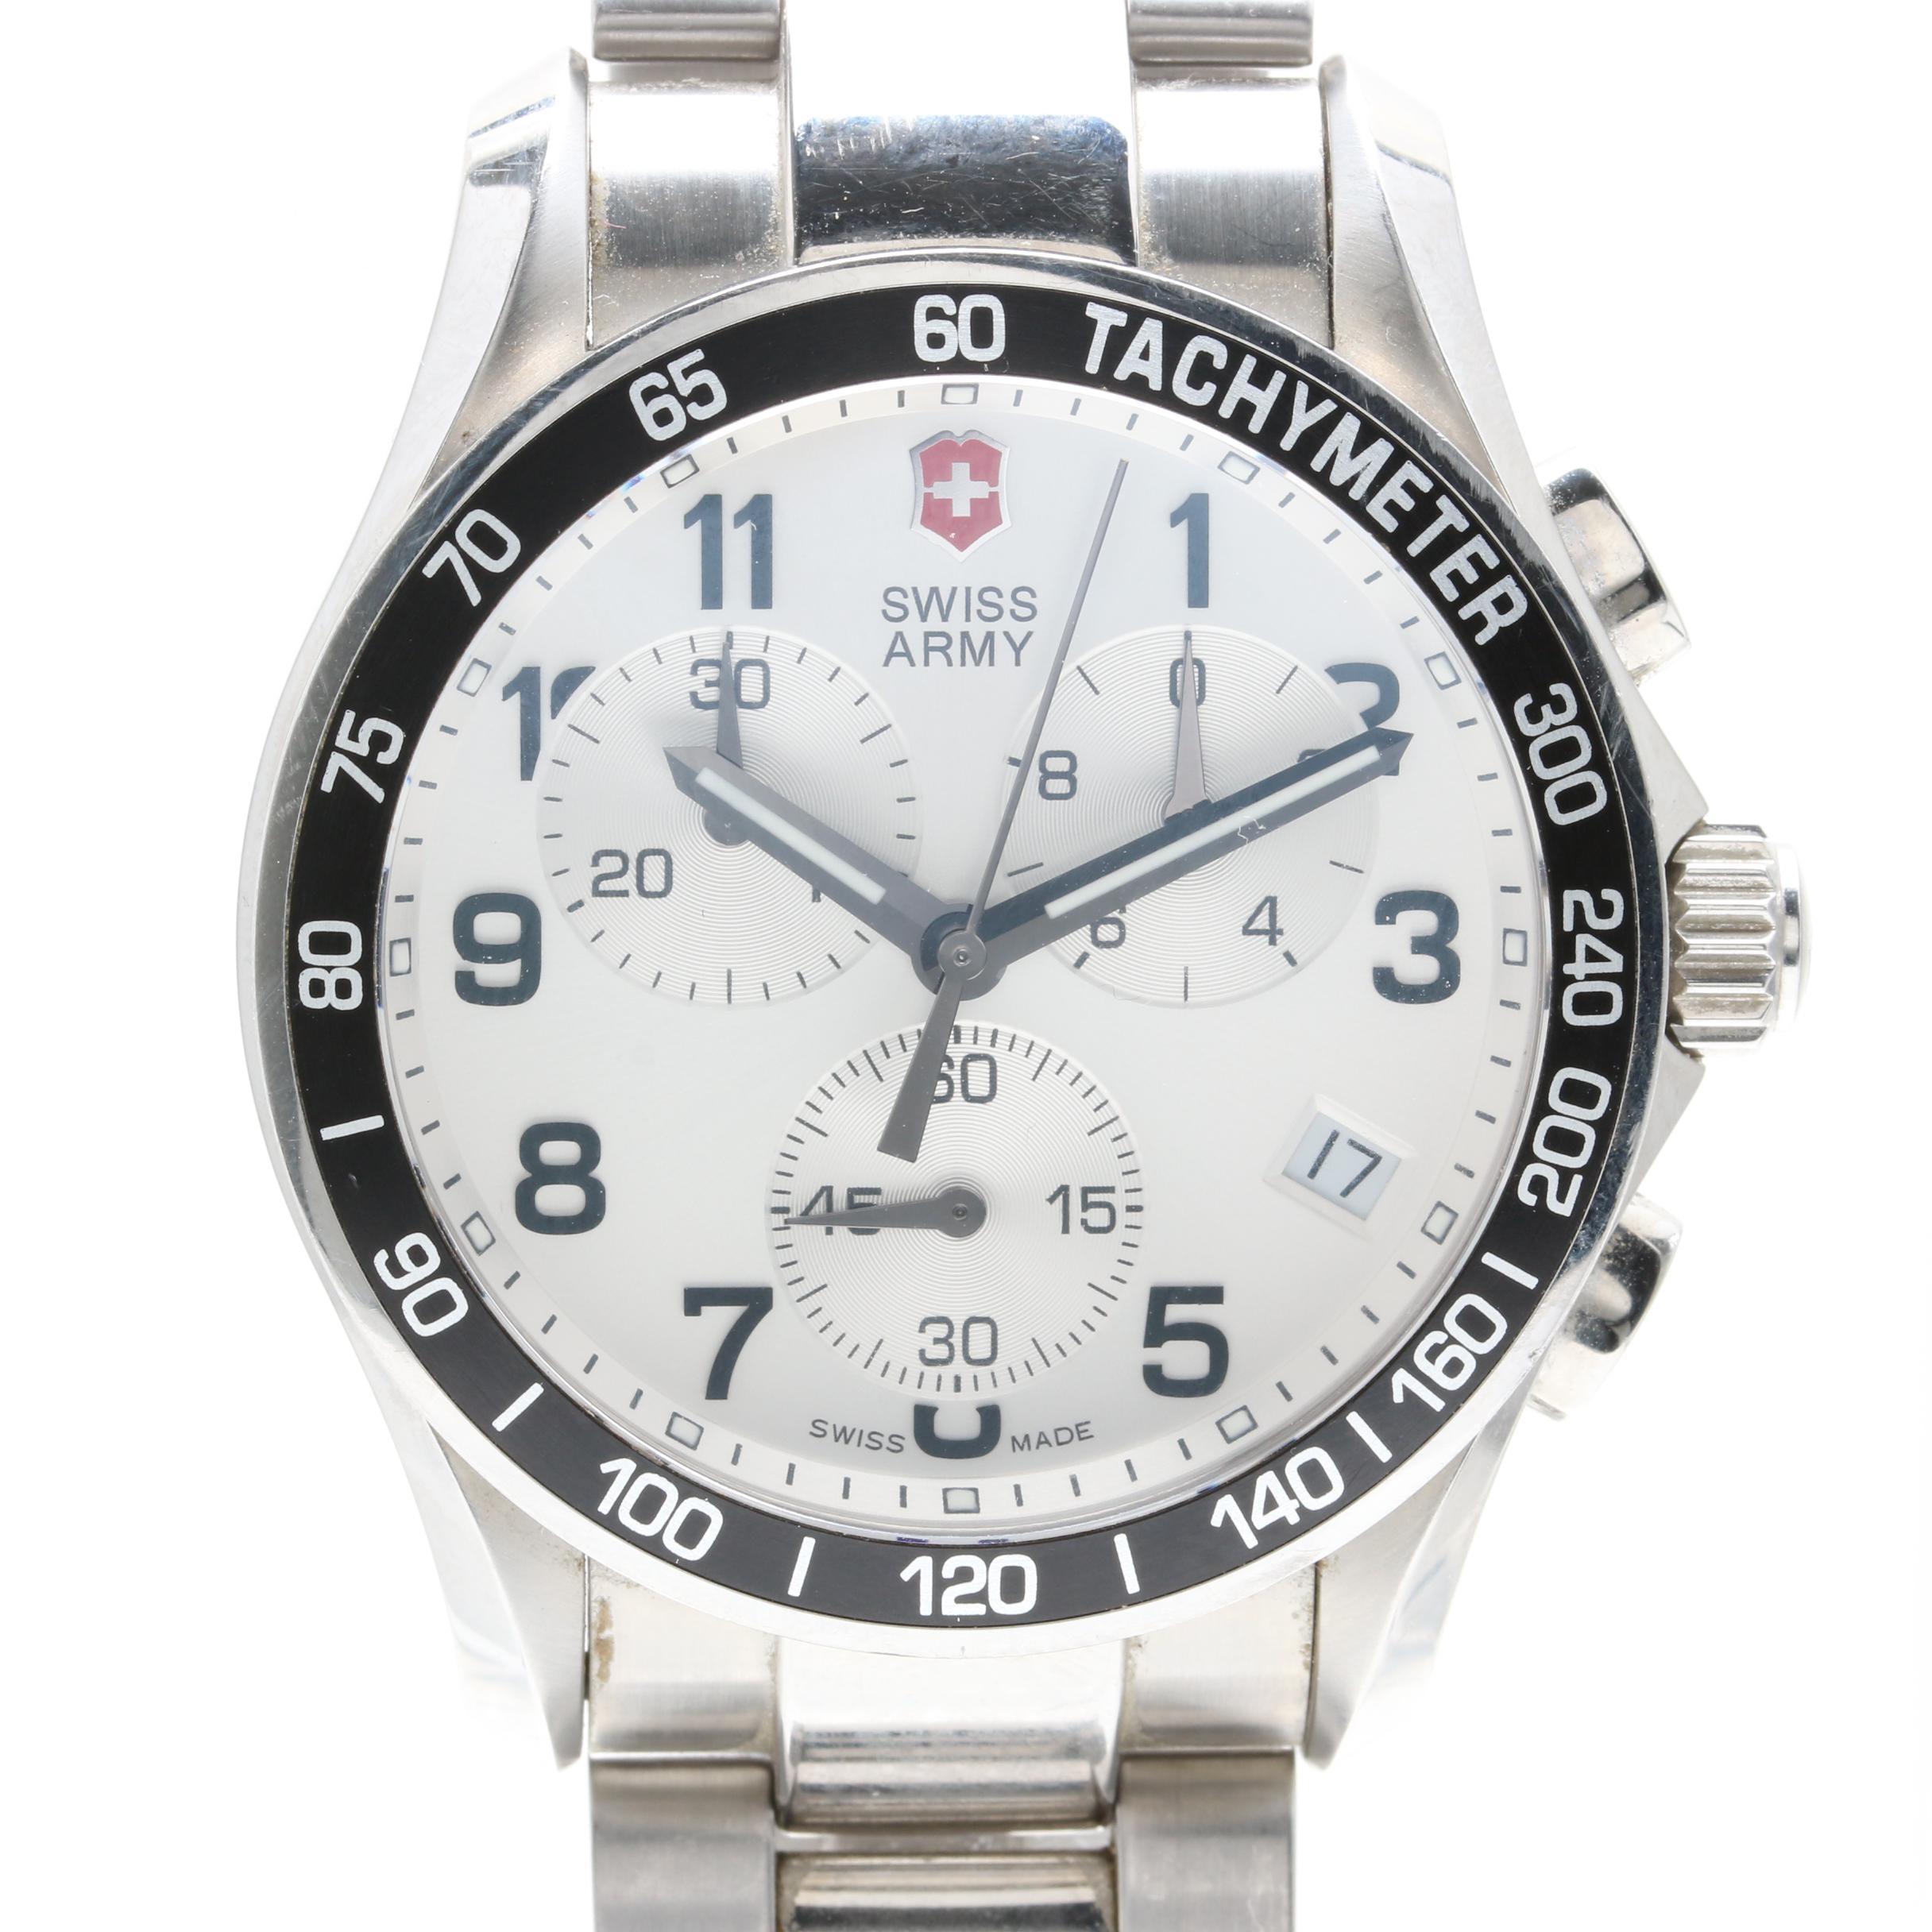 Swiss Army Stainless Steel Chronograph Wristwatch